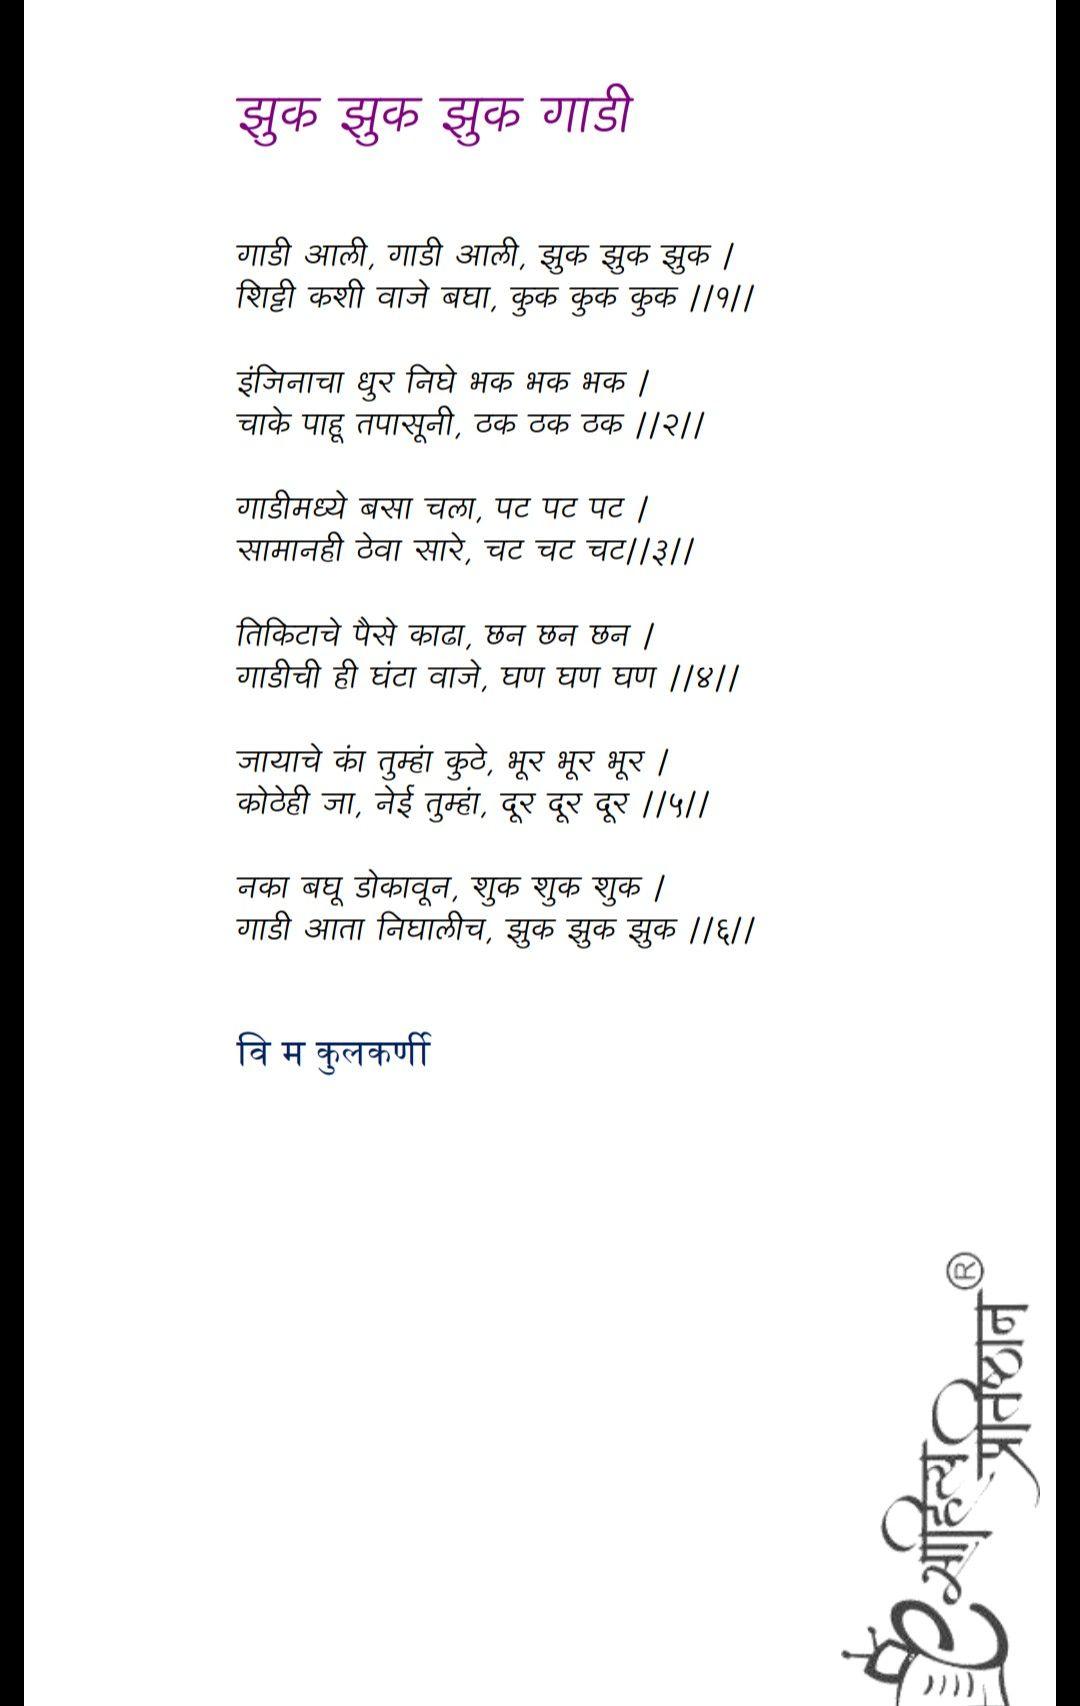 Marathi Poems Collection Wapnil Marathi Poems Friendship Poems Kids Poems